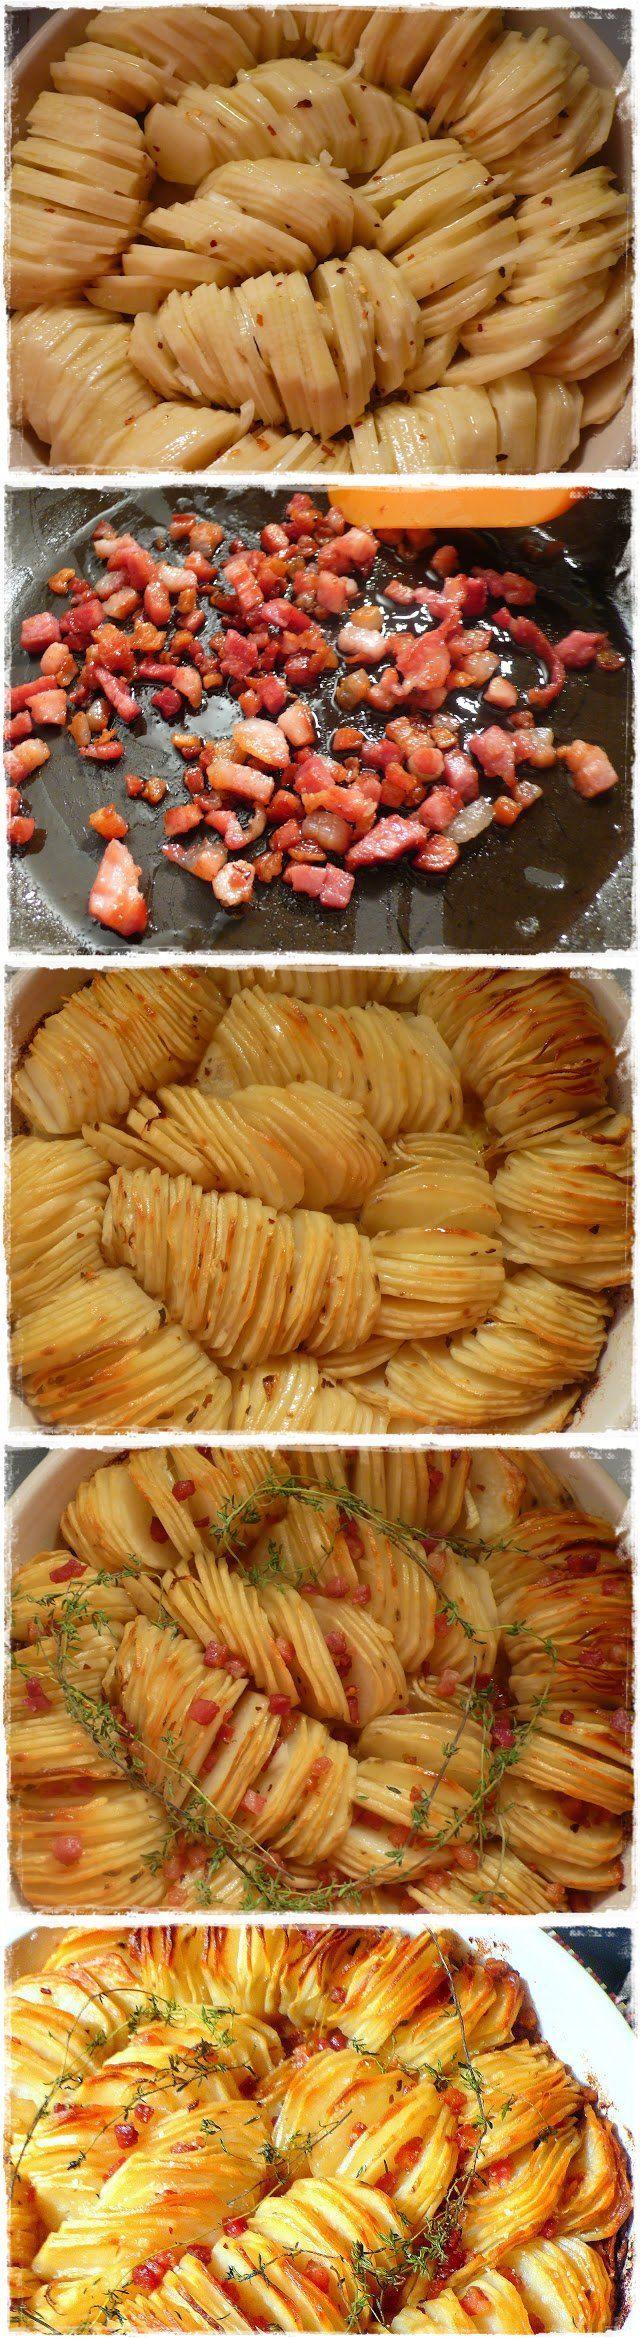 DIY Delicious Crispy Potato Roast | I want in my Tummy!!! | Pinterest